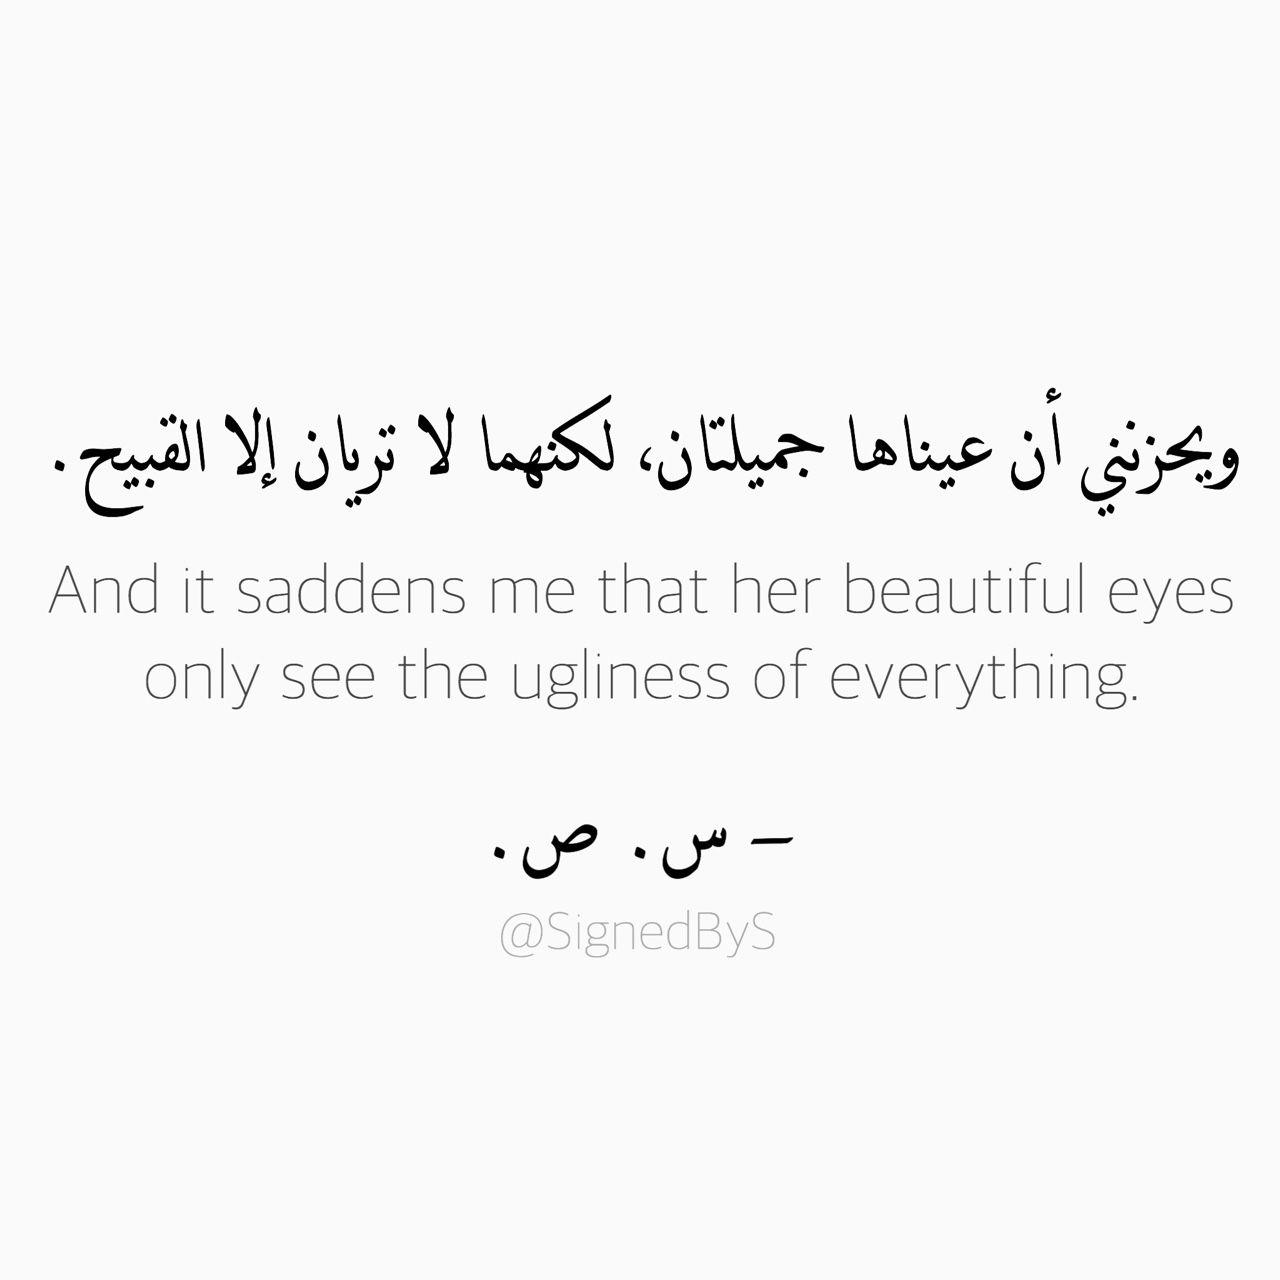 س ص كن جميلا ترى الوجود جميلا إيليا أبو ماضي Be Arabic English Quotes Motivatinal Quotes Pretty Words